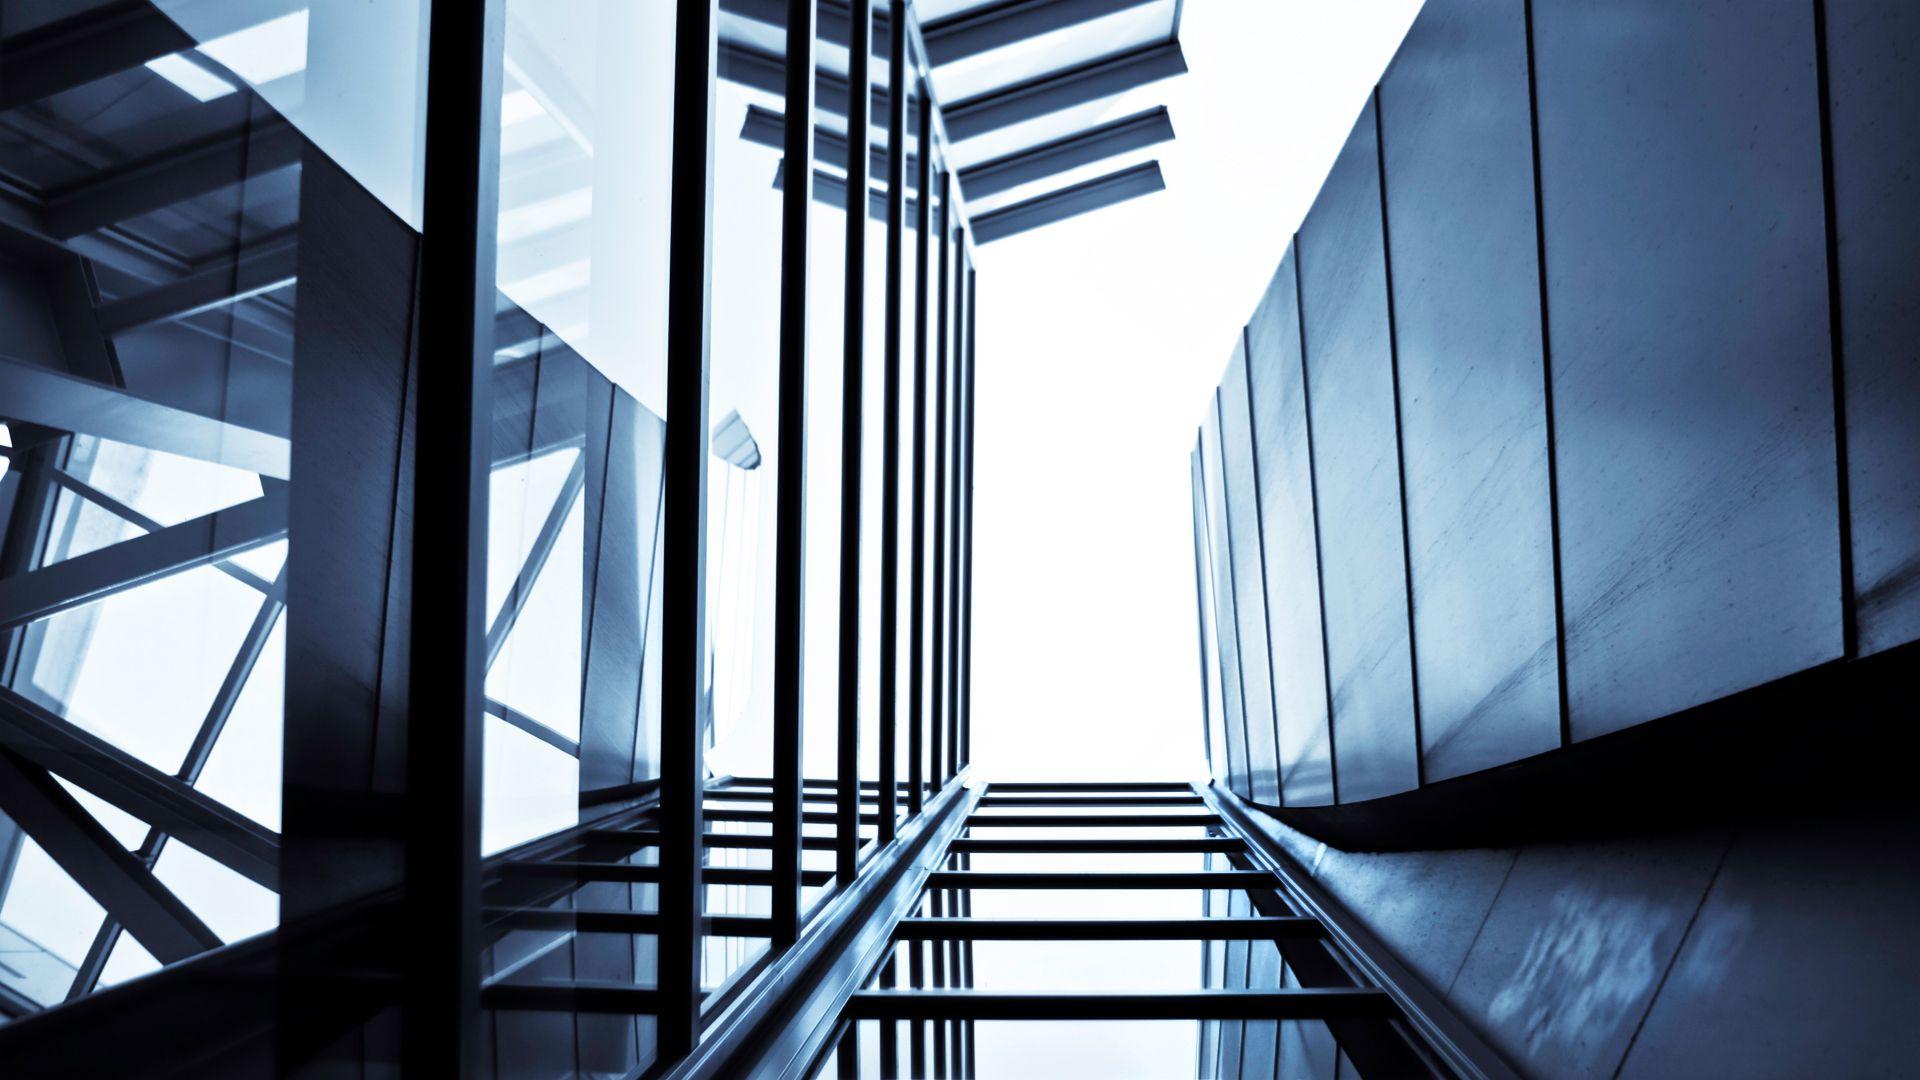 Architecture background image